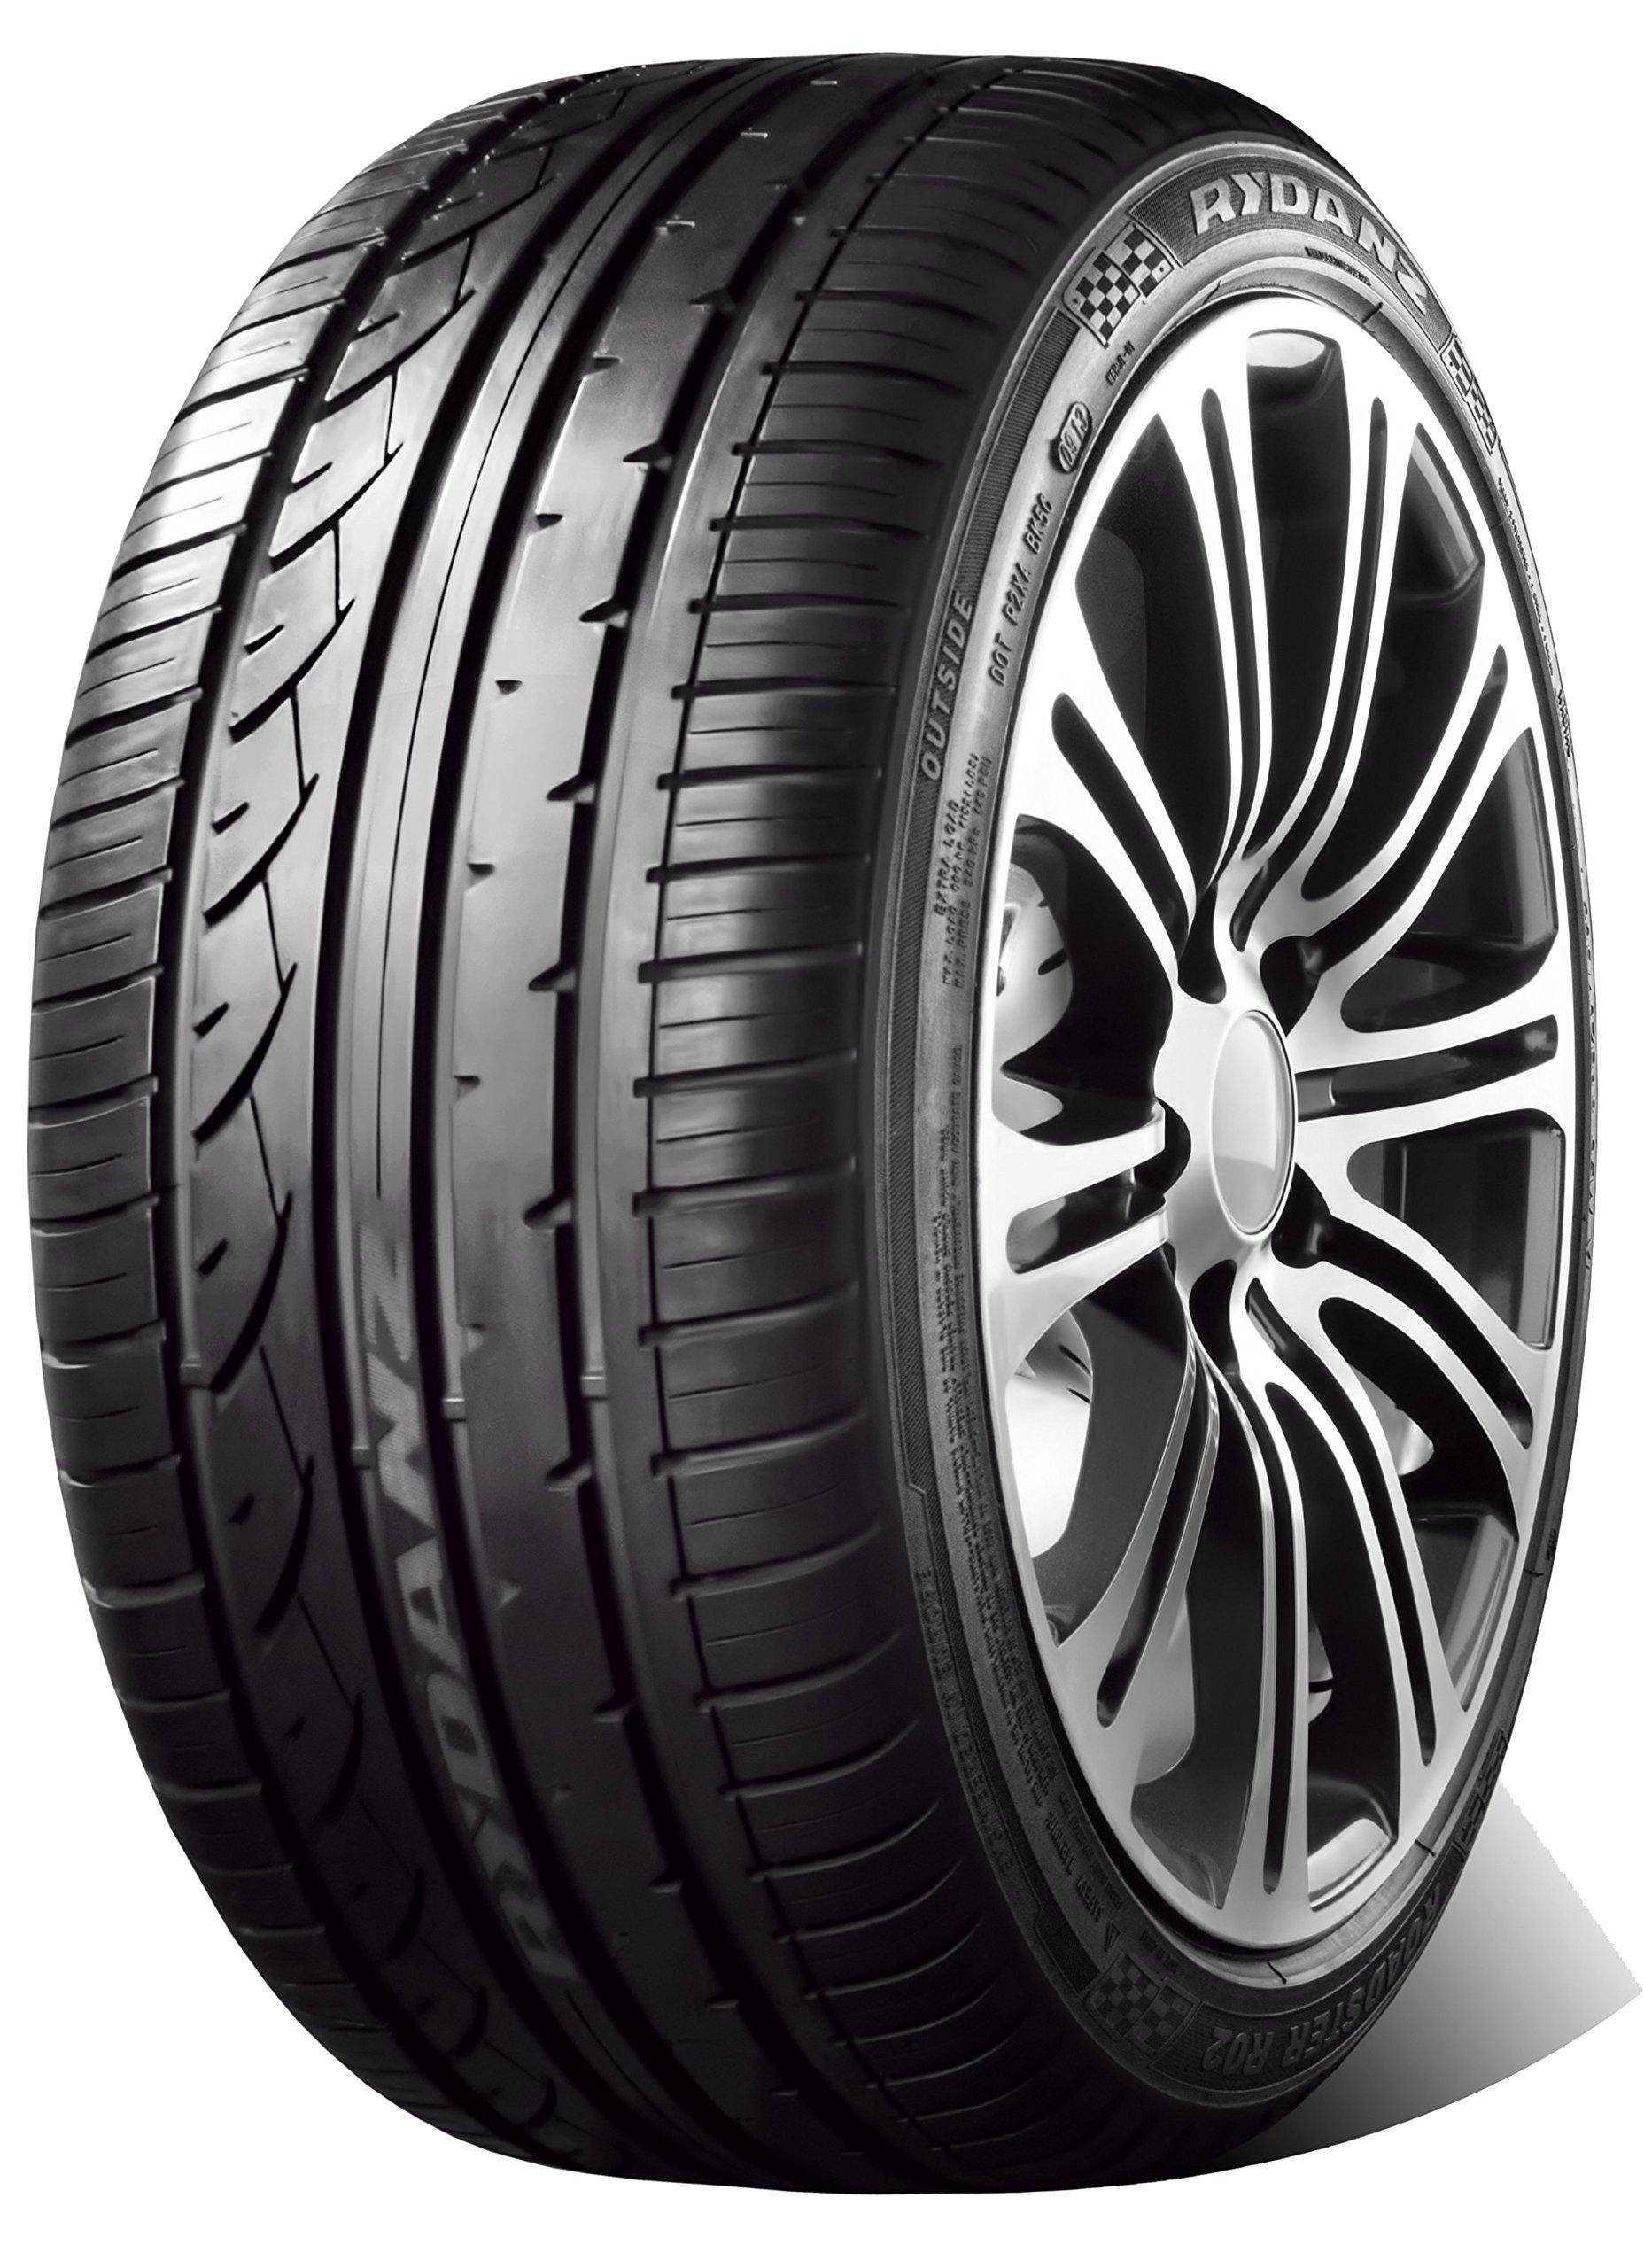 Rydanz ROADSTER R02 Performance Radial Tire - 245/40R18 93Y